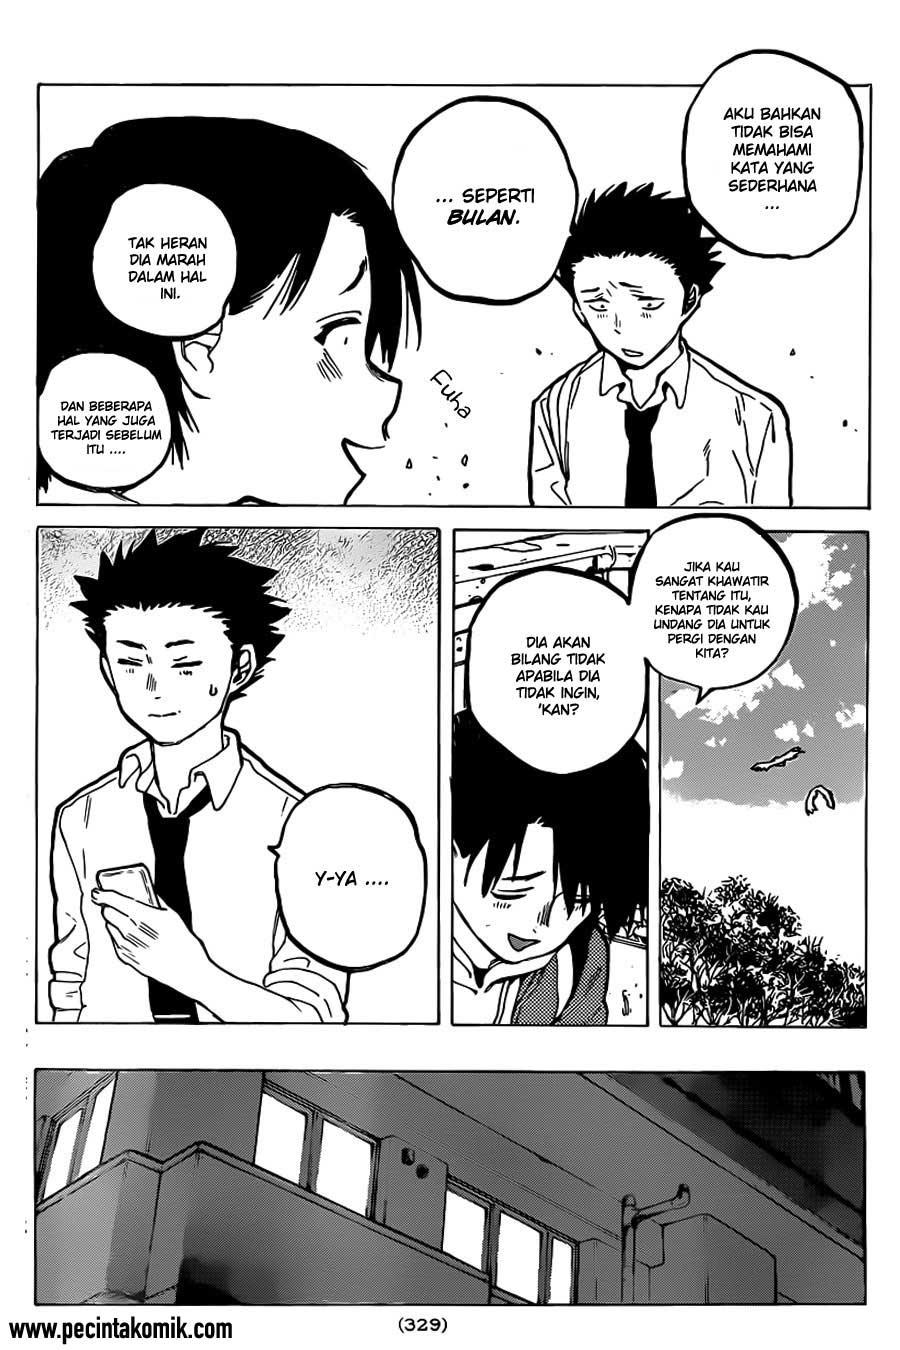 Koe no Katachi Chapter 24-18